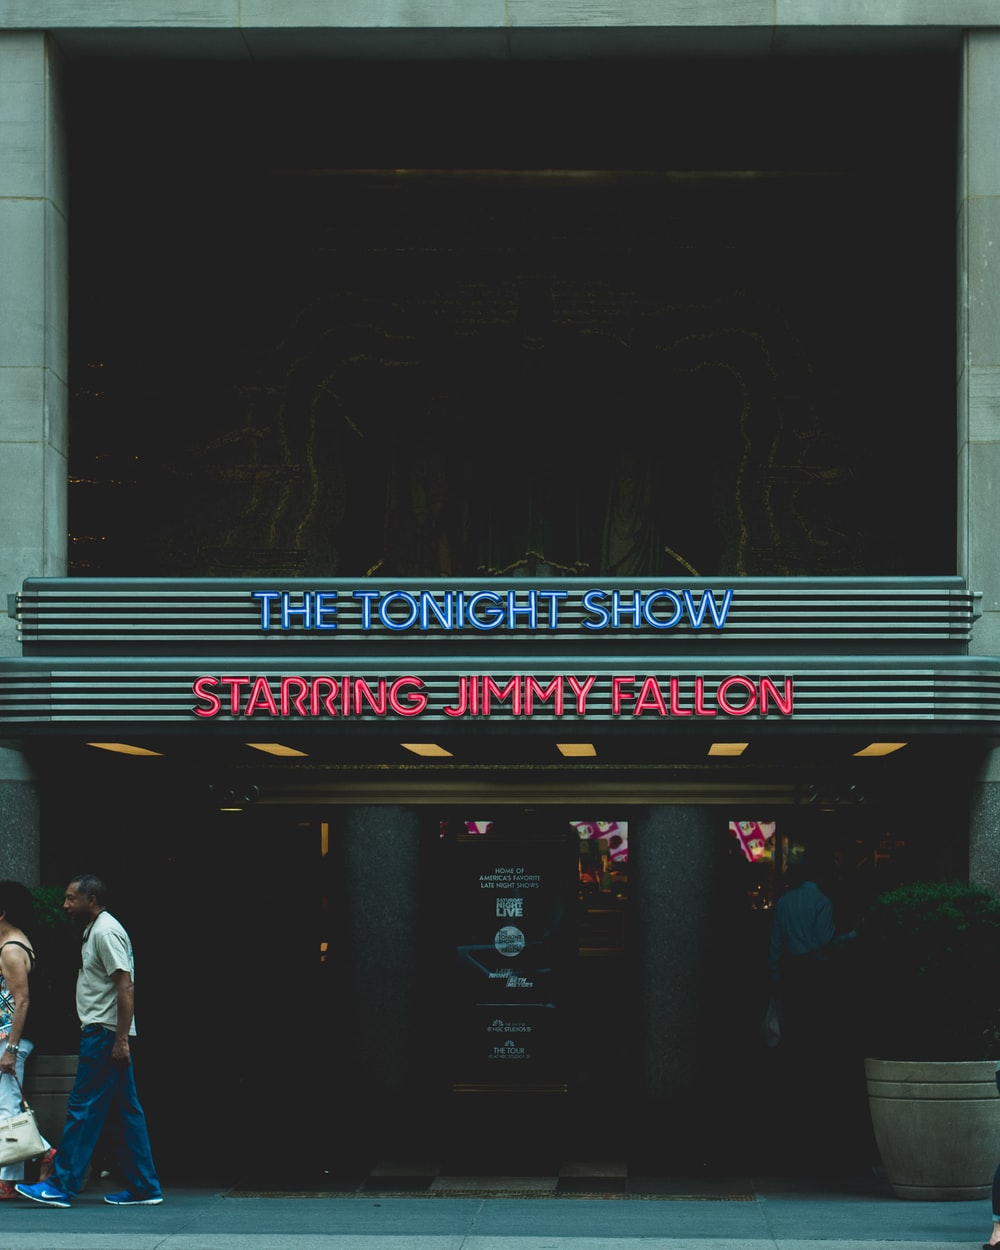 The Tonight Show Starring Jimmy Fallon building